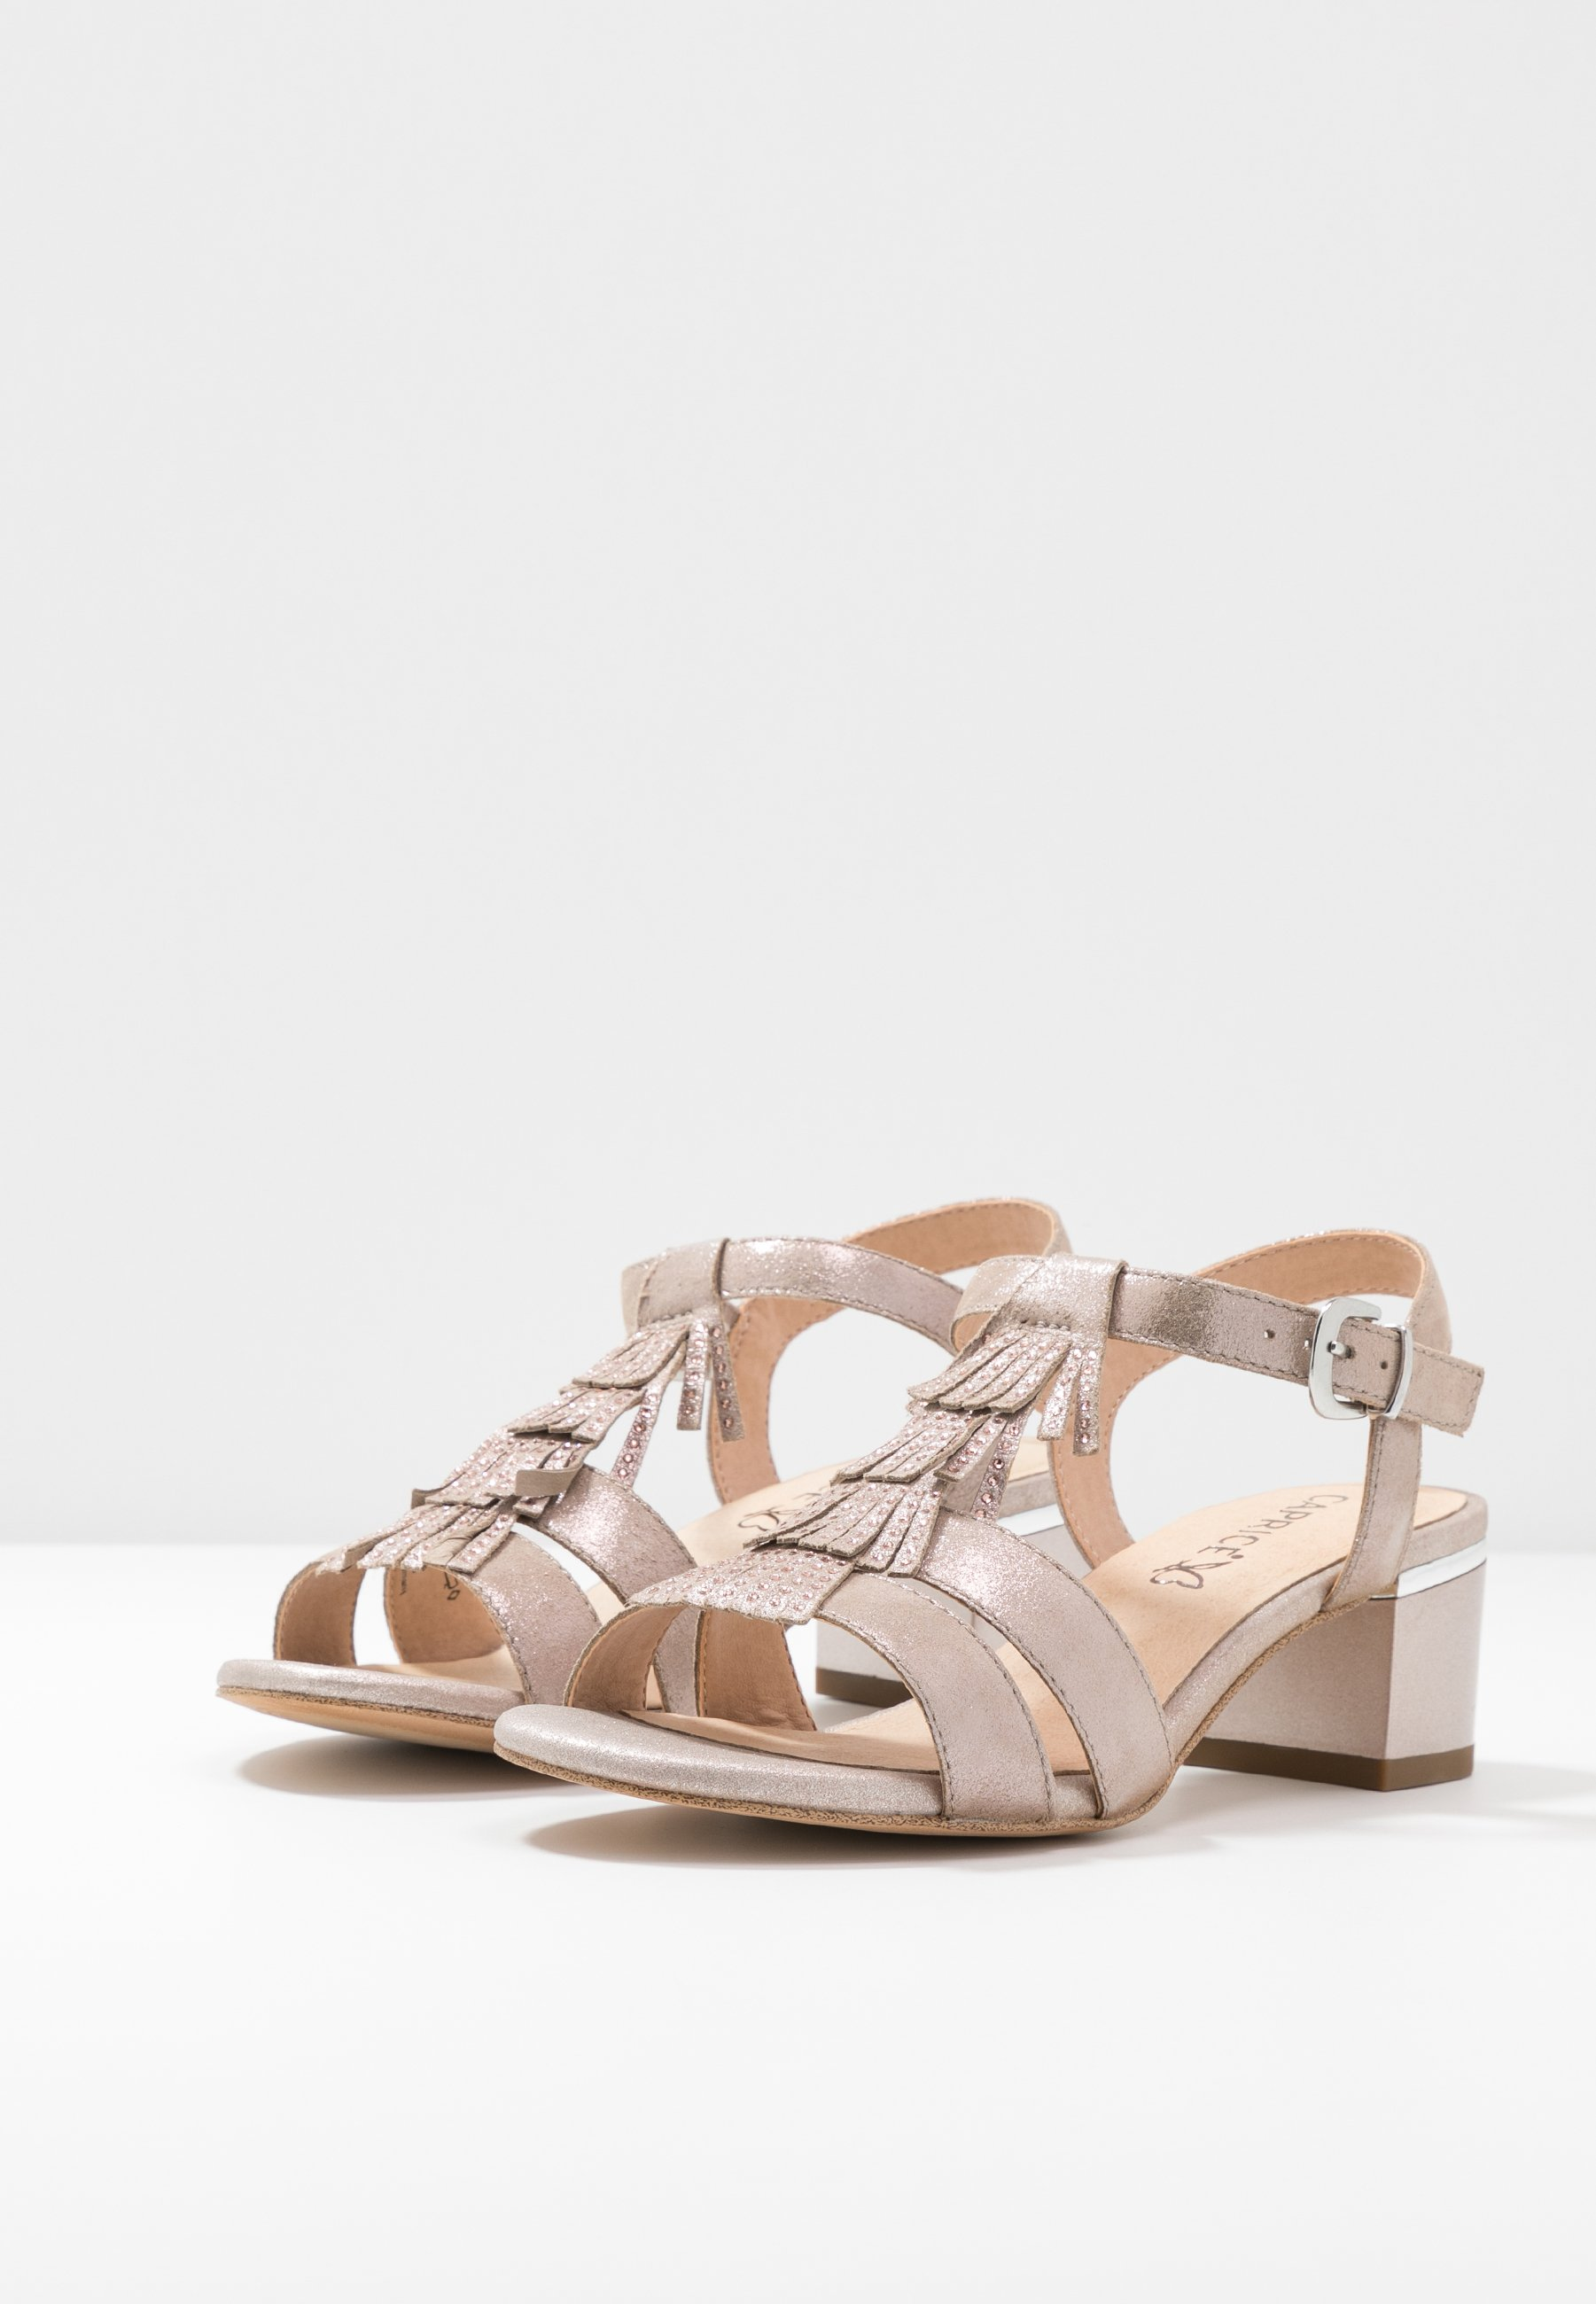 Caprice Sandales - taupe metallic